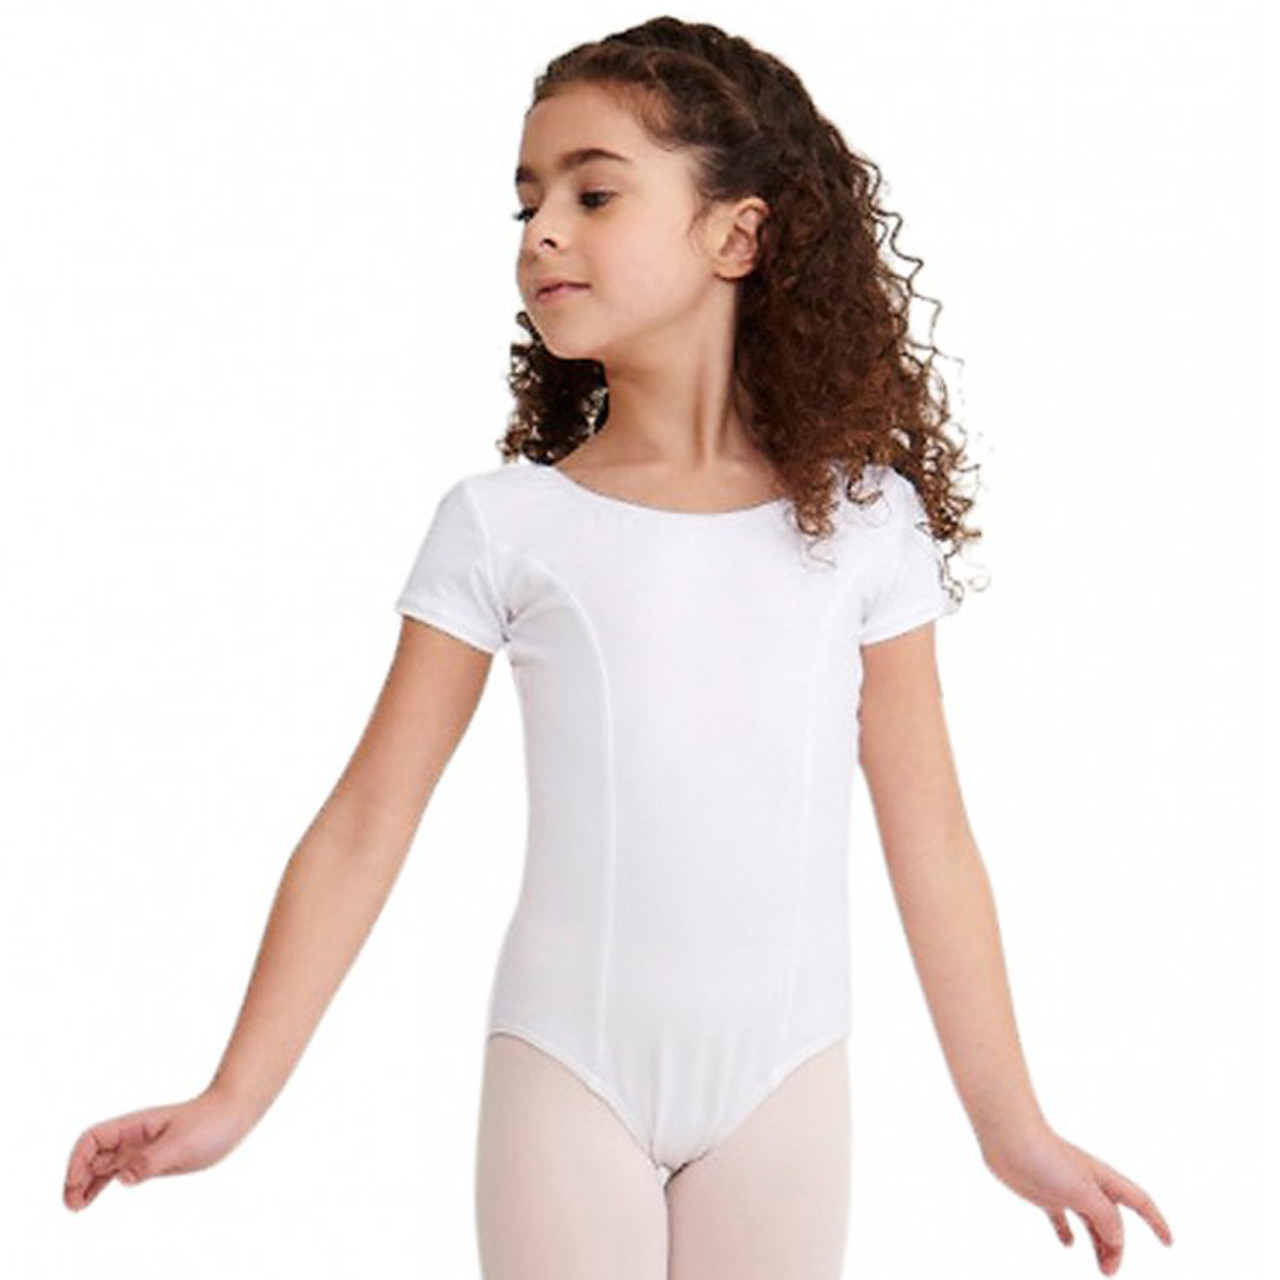 64ea4b4d2d72 Capezio Princess Seam Short Sleeve Leotard Child - 4 dance